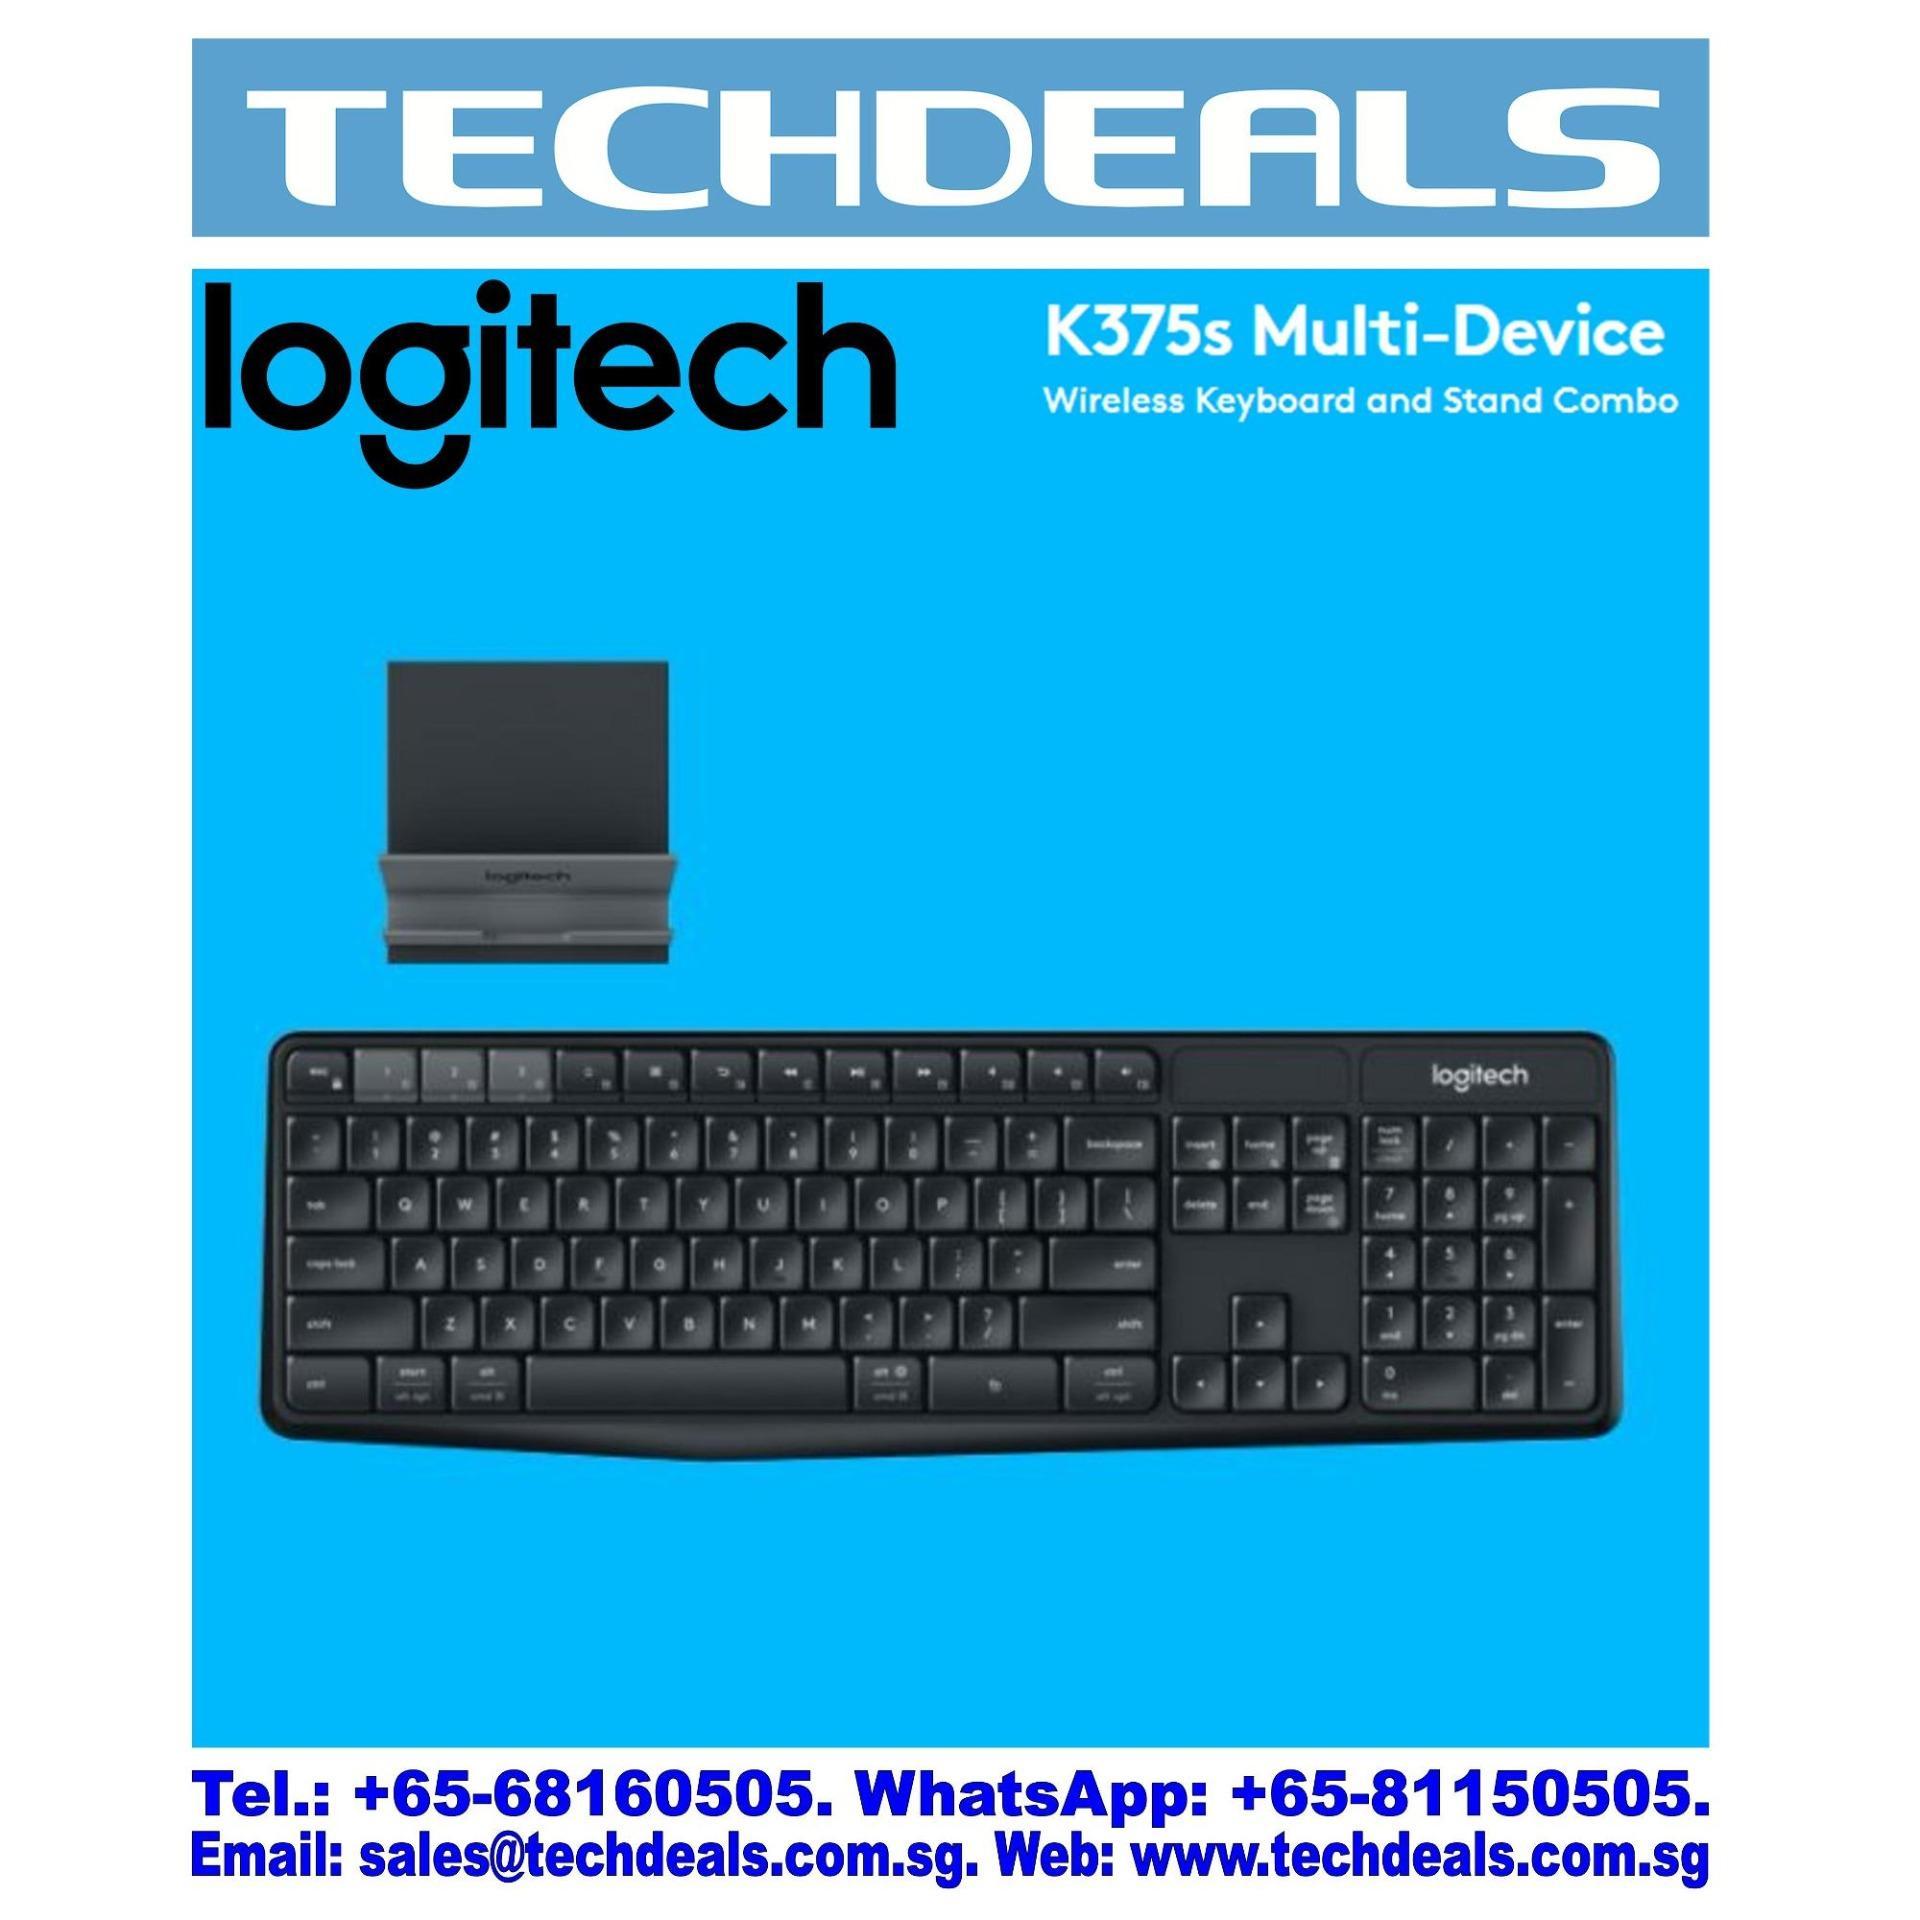 Logitech K375s Multi Device Wireless Keyboard And Stand Combo Black Kombo Dan Dudukan 1y